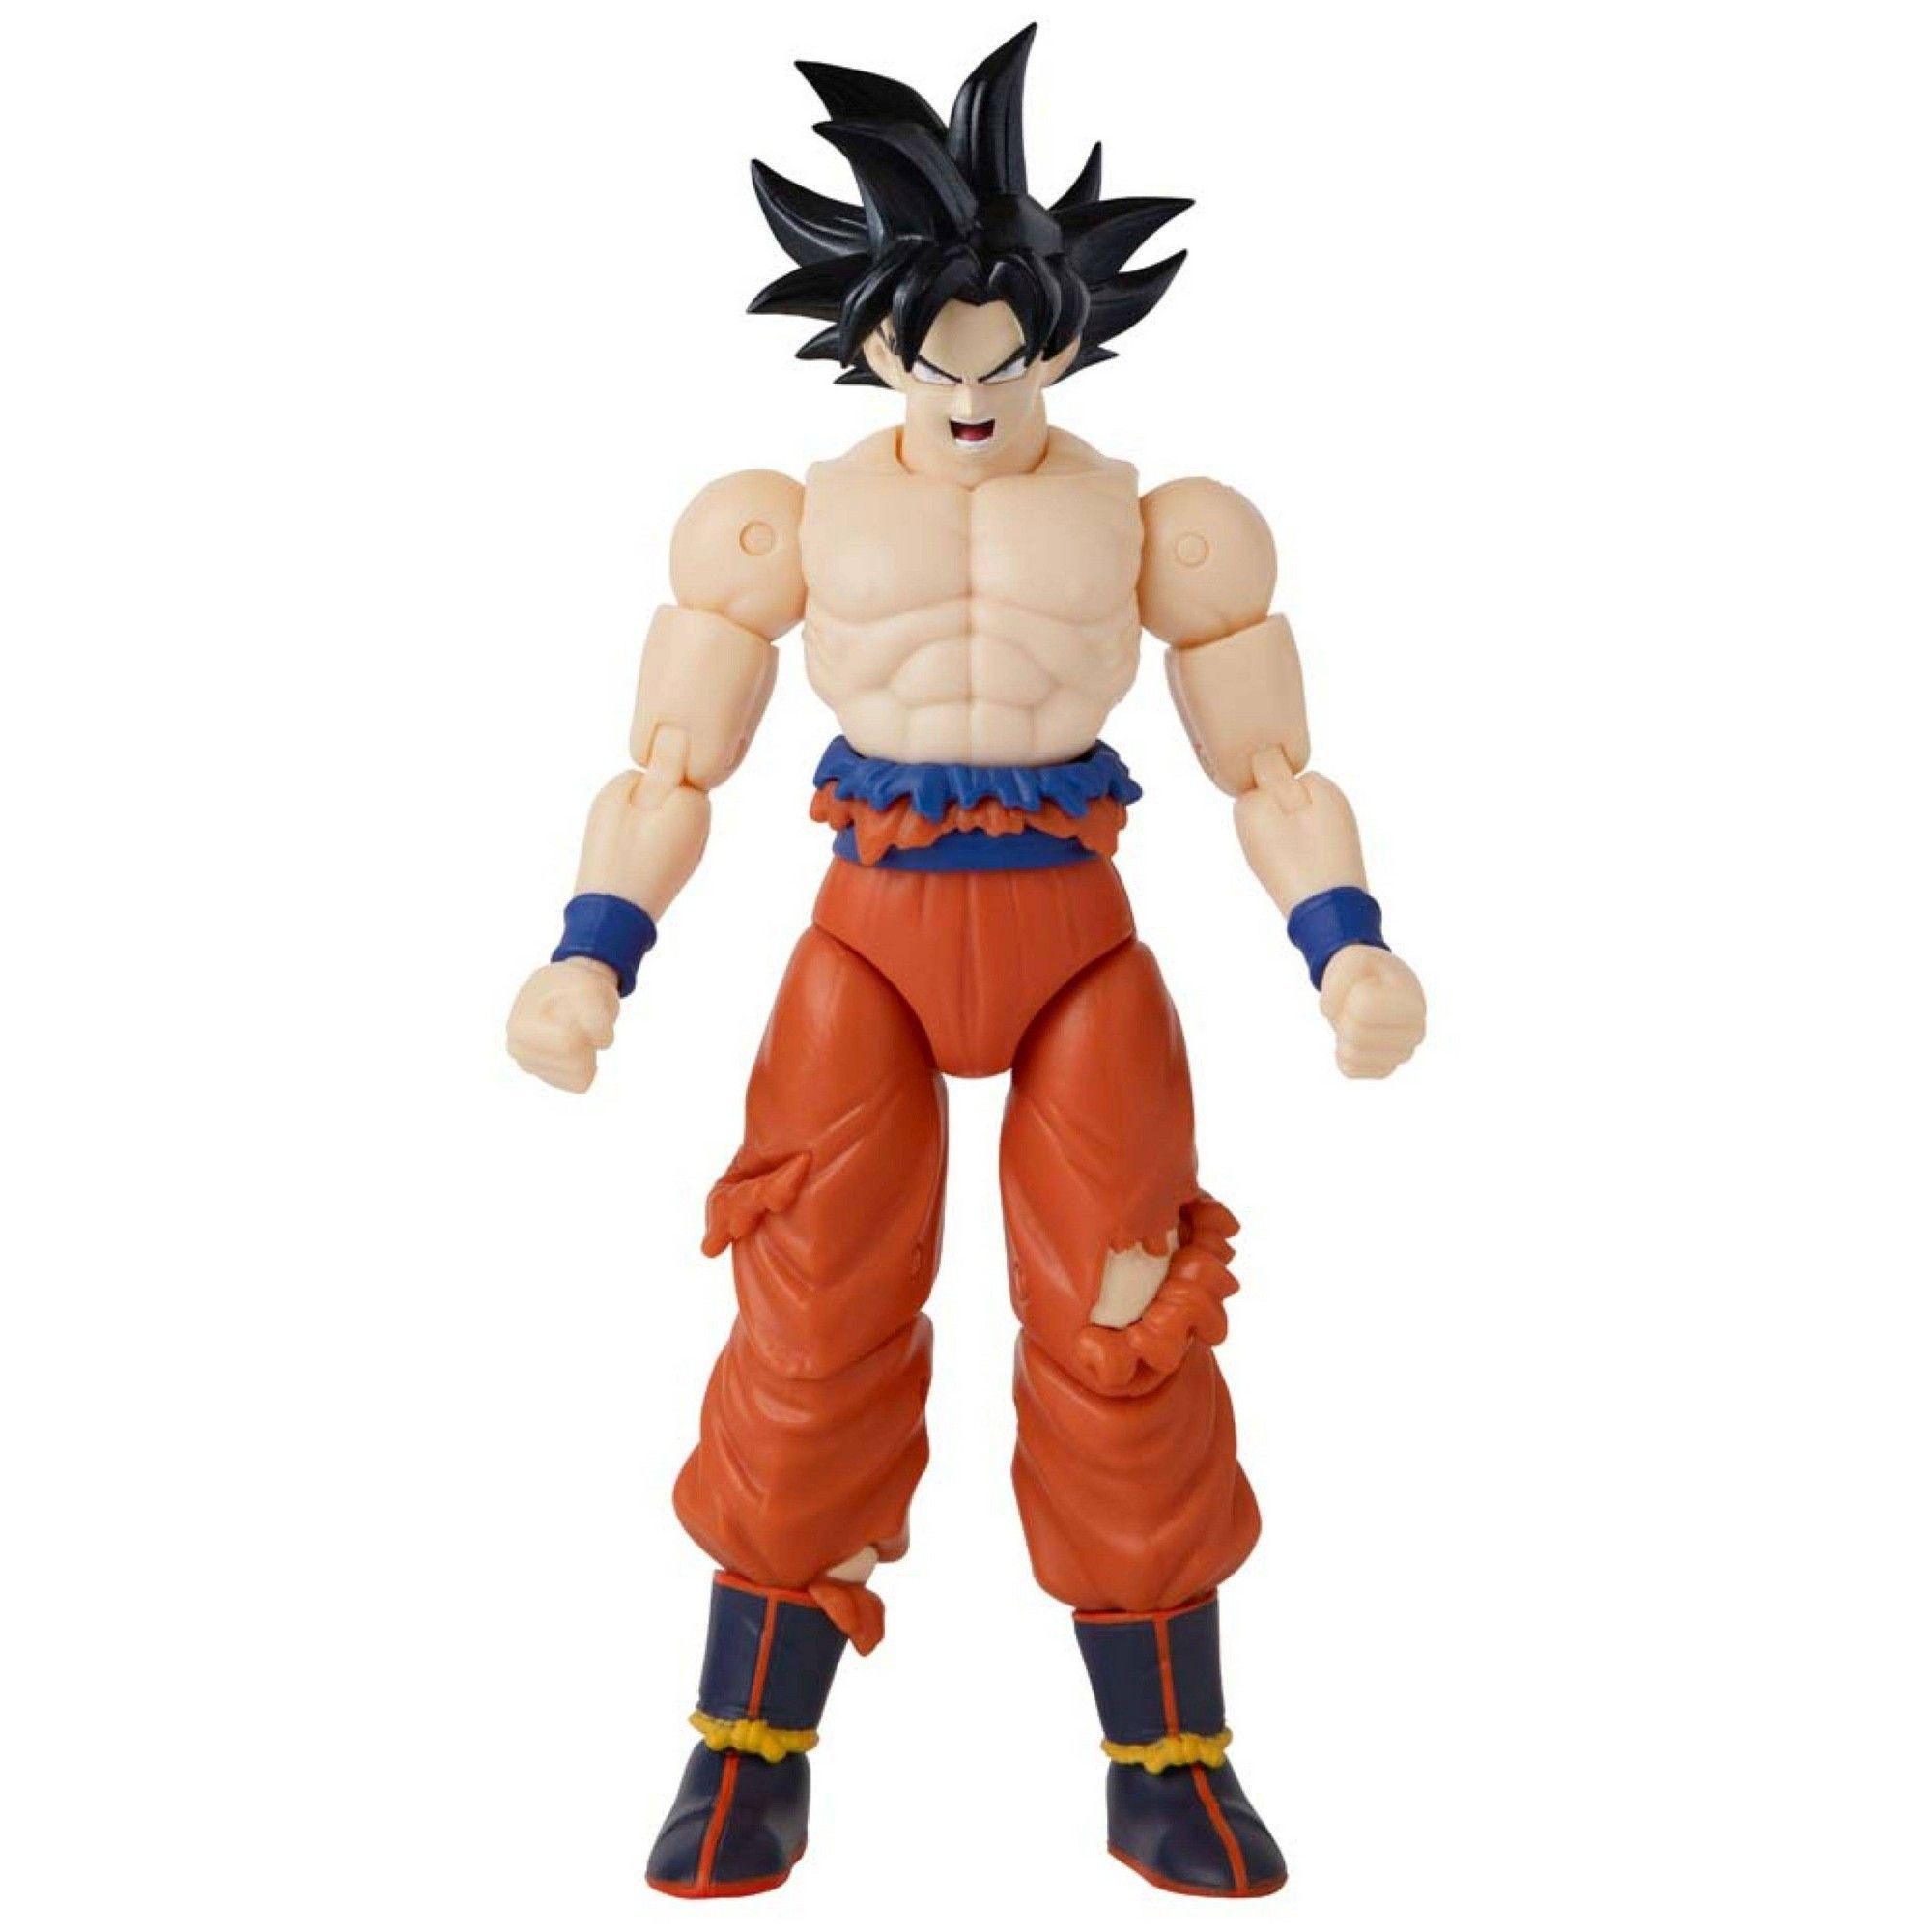 Dragon Ball Super Instinct Goku Action Figure In 2020 Dragon Star Dragon Ball Dragon Ball Super